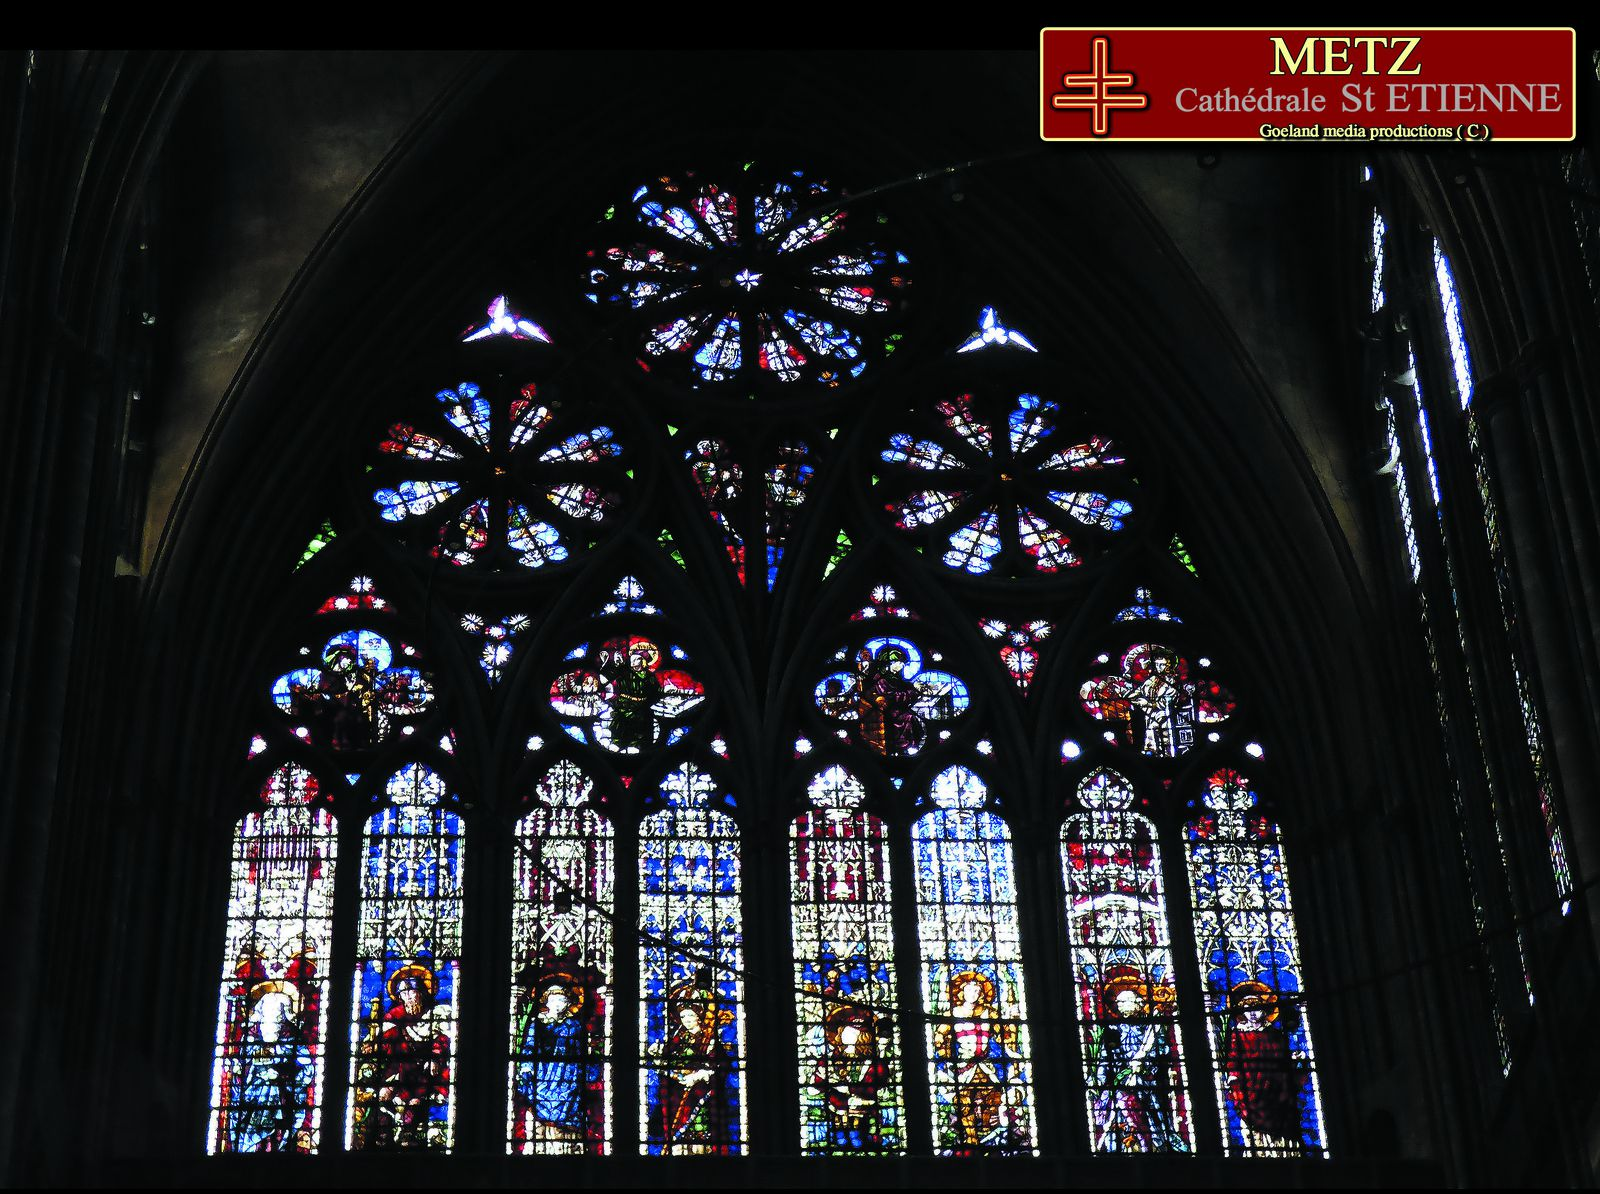 Cathédrale de METZ - vitraux déambulatoire - goelandmedia.prod@gmail.com (c) - photos bj(c)